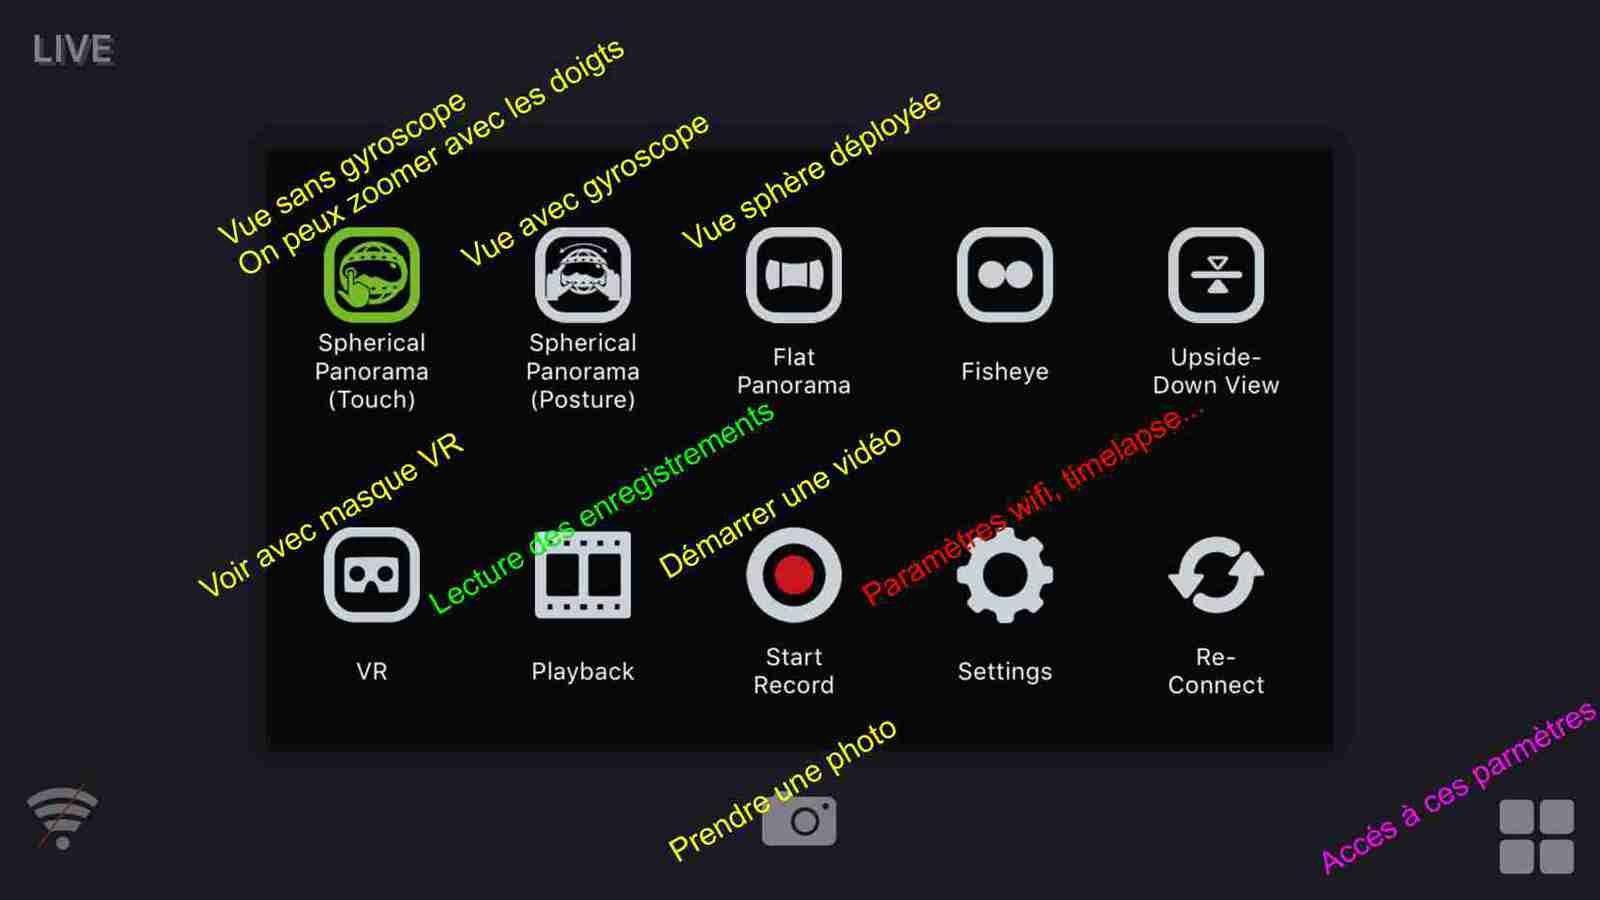 Plein de paramètres sympa dans l'appli. GVT-720i